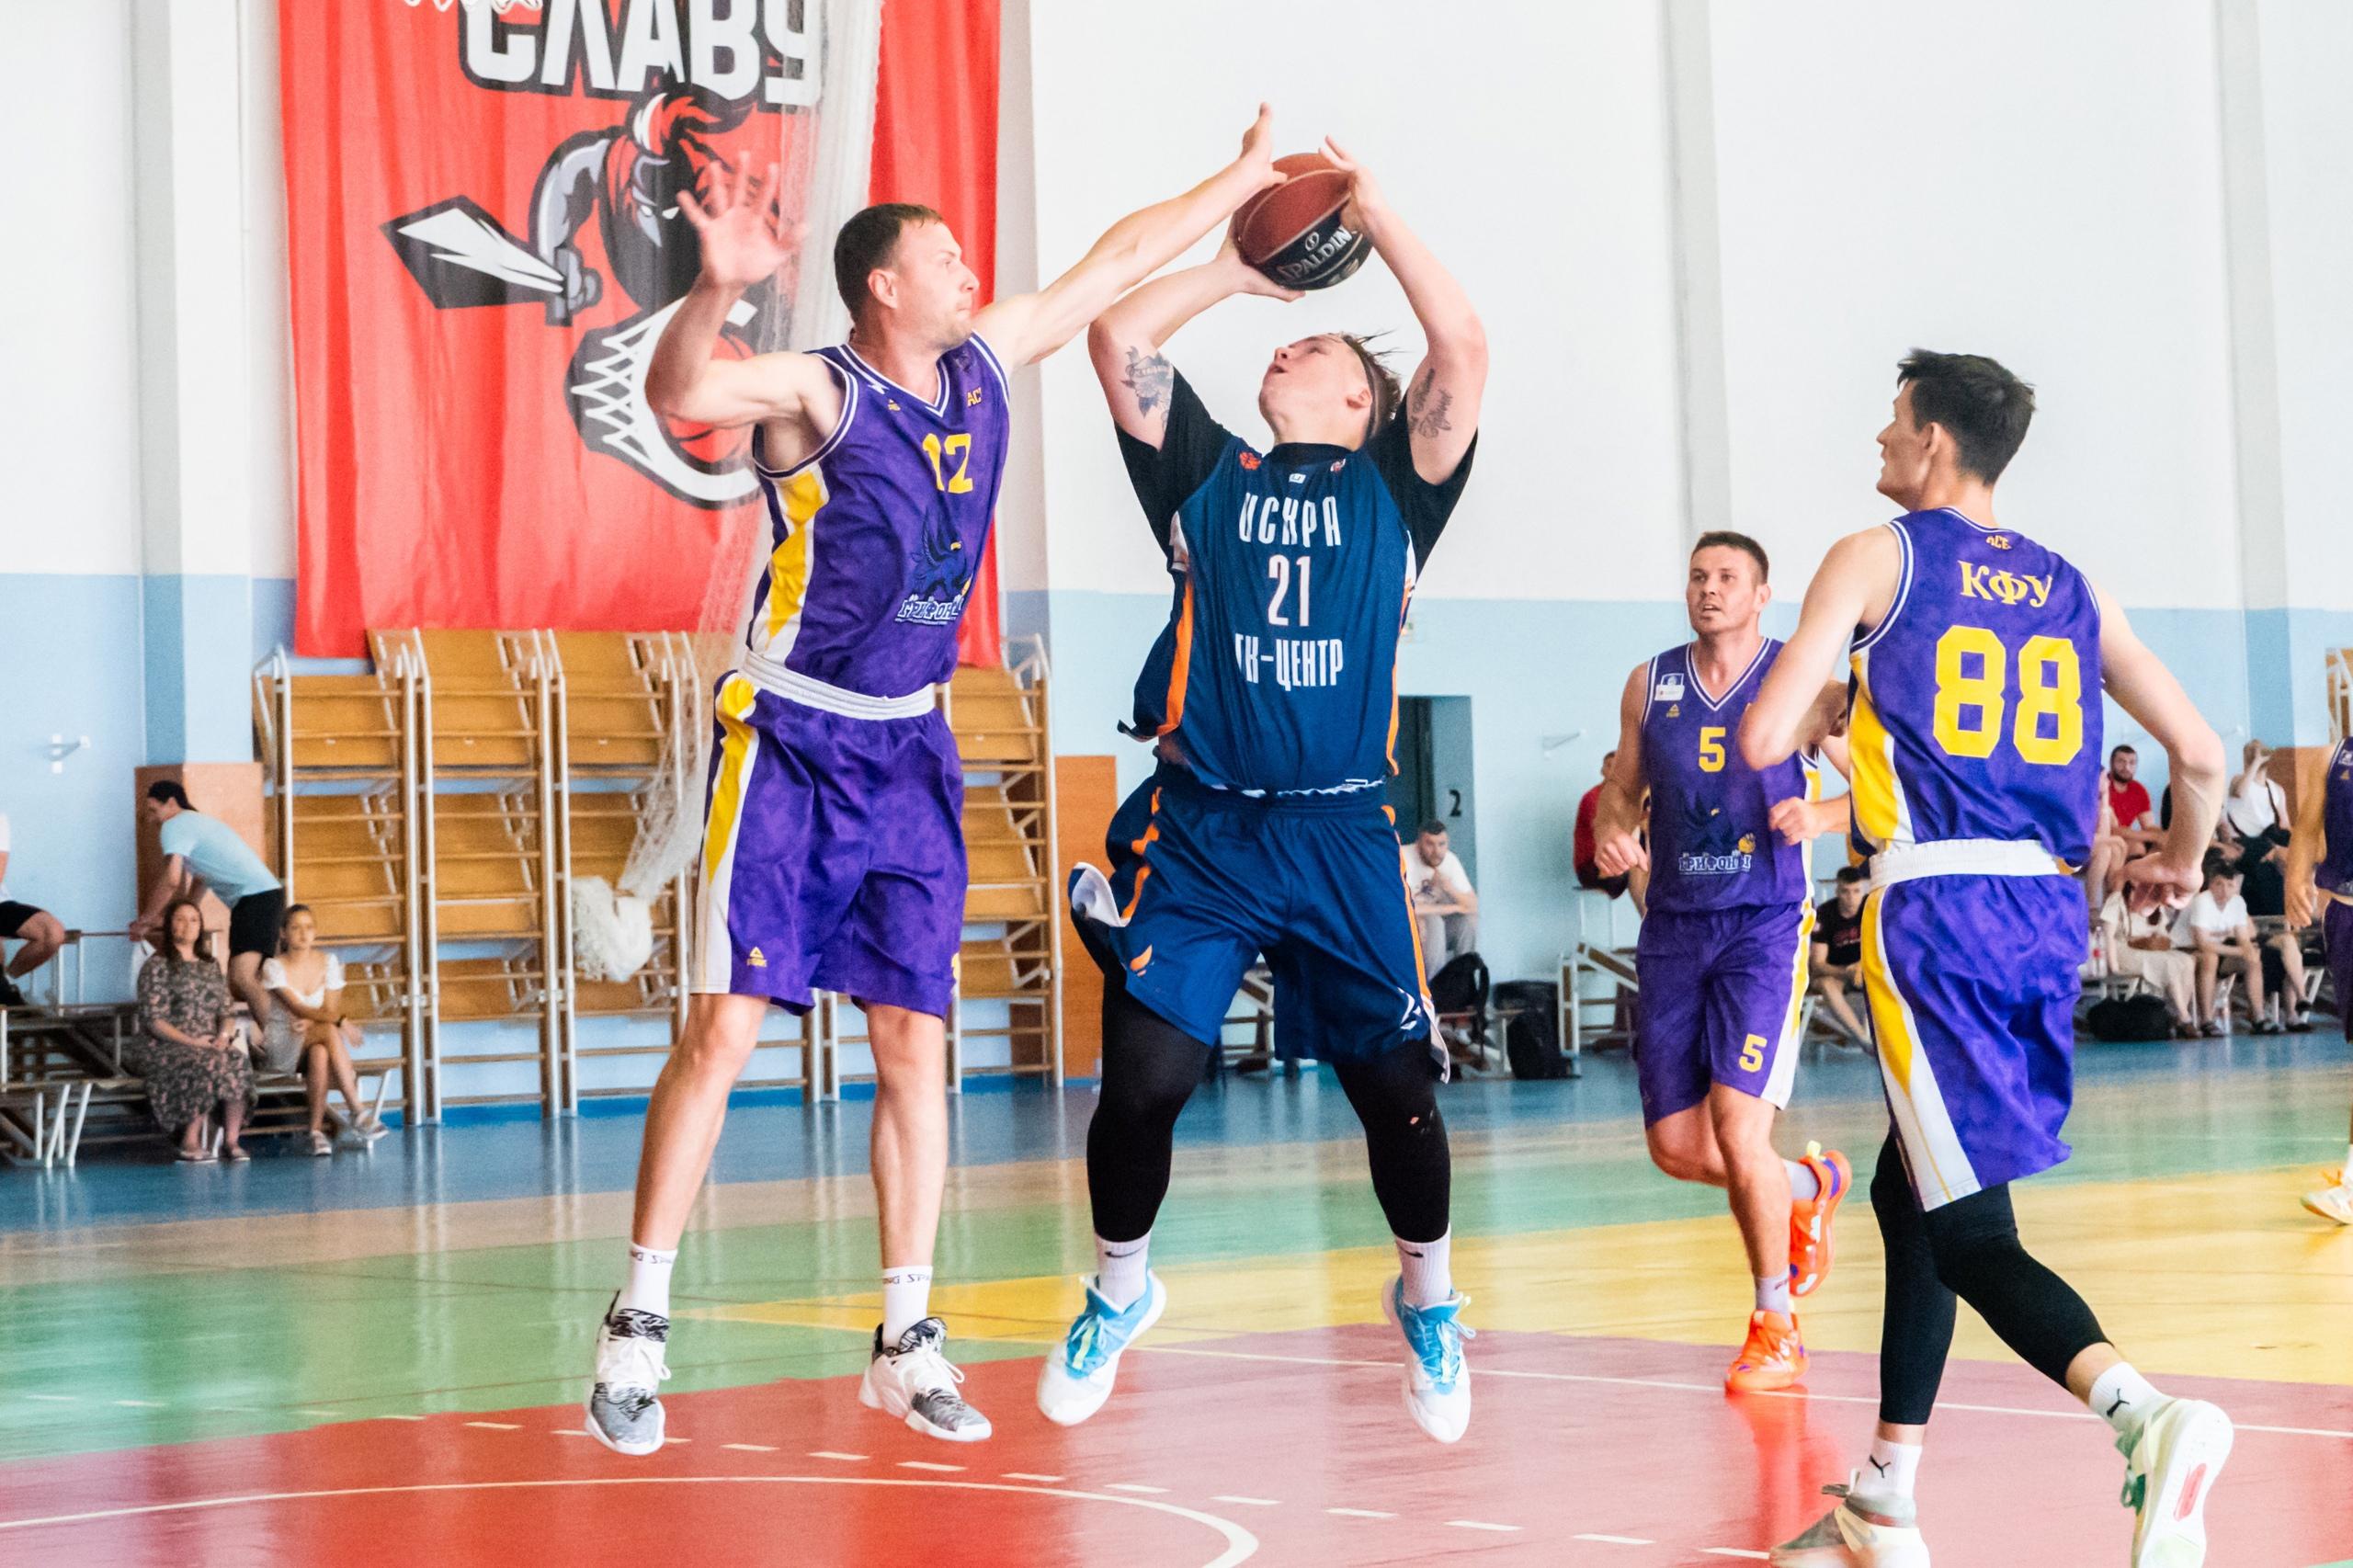 МЛБЛ-Юг Краснодар 2021